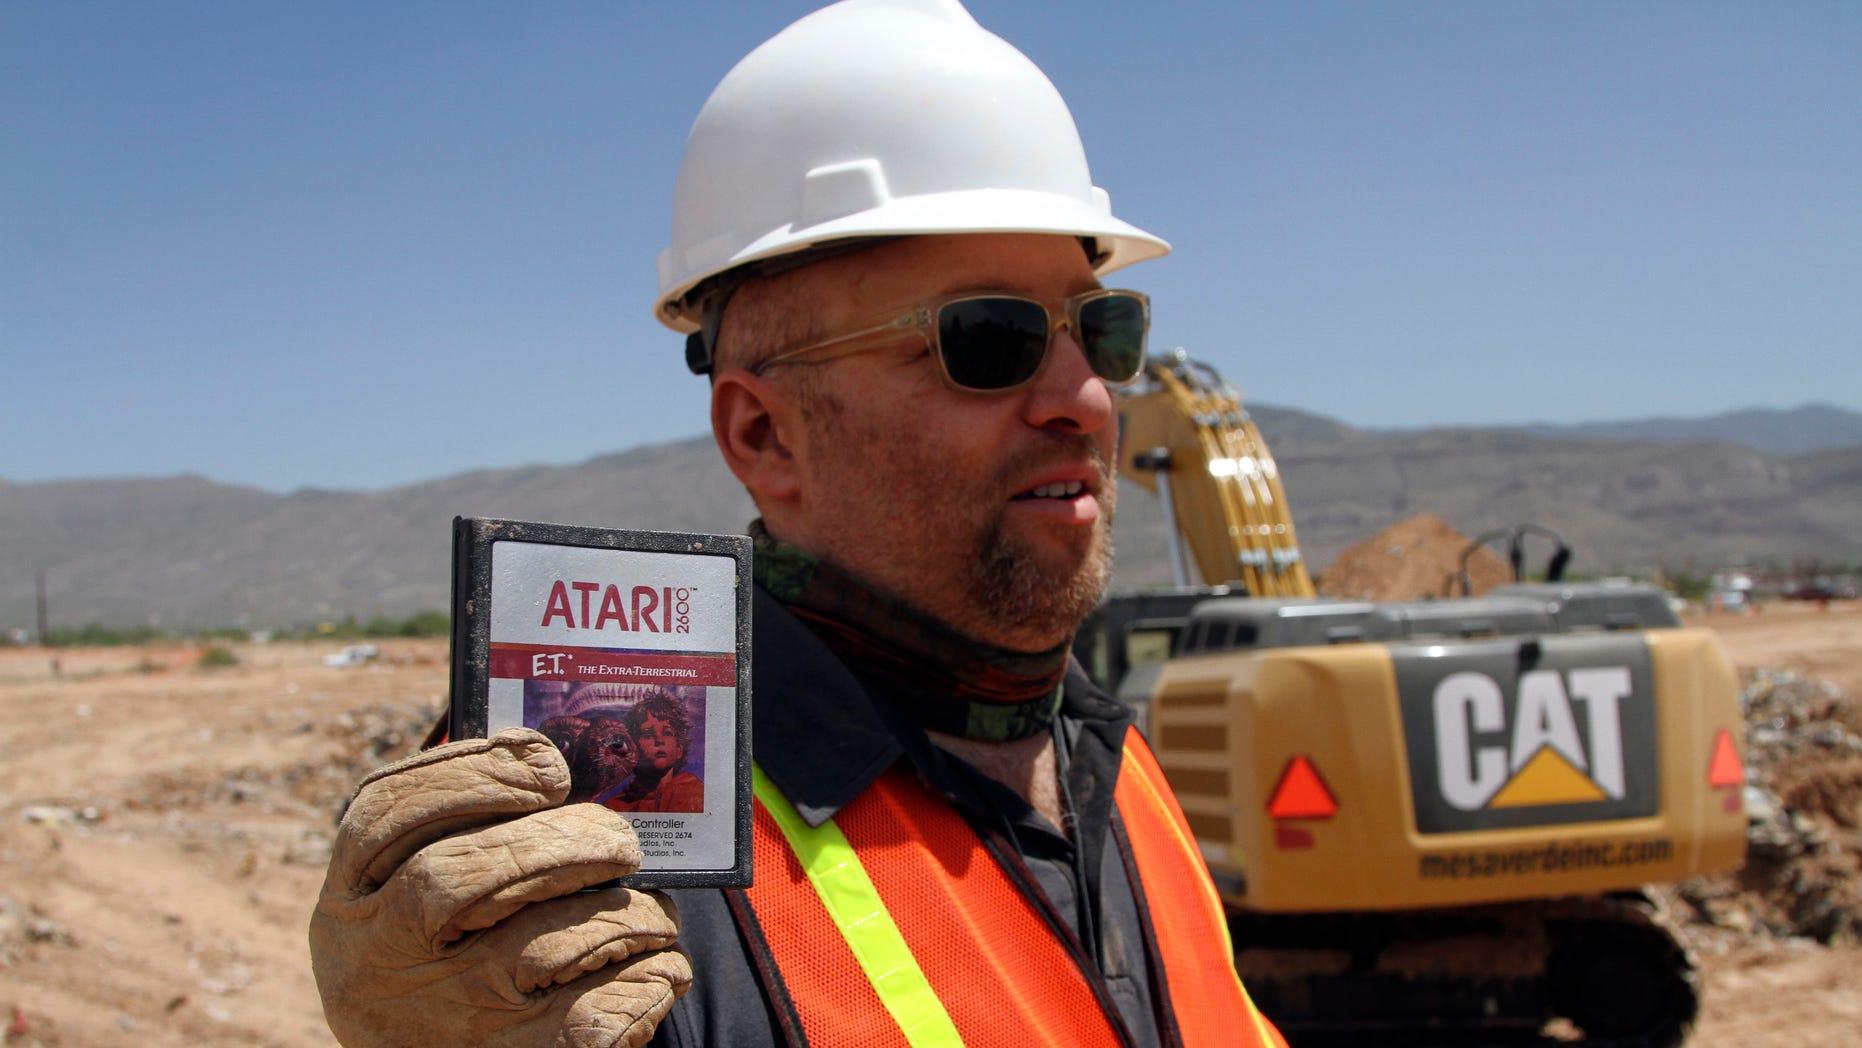 April 26, 2014: Film director Zak Penn shows a box of a decades-old Atari 'E.T. the Extra-Terrestrial' game found in a dumpsite in Alamogordo, N.M.